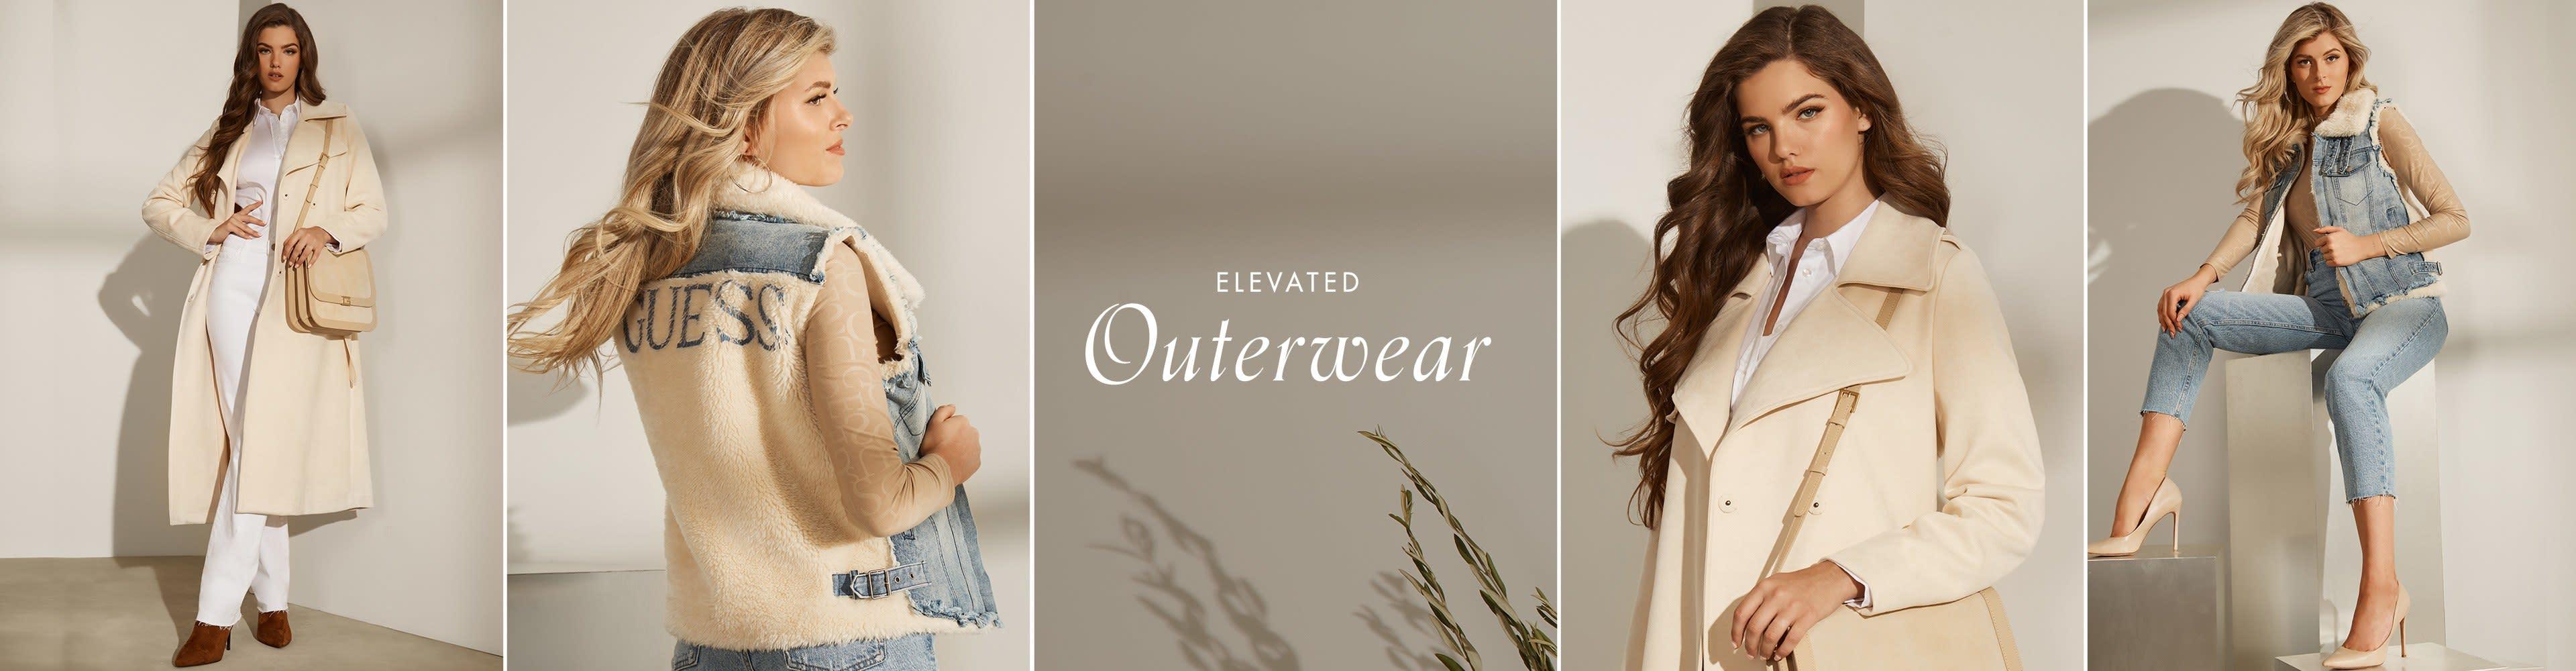 Outerwear for women